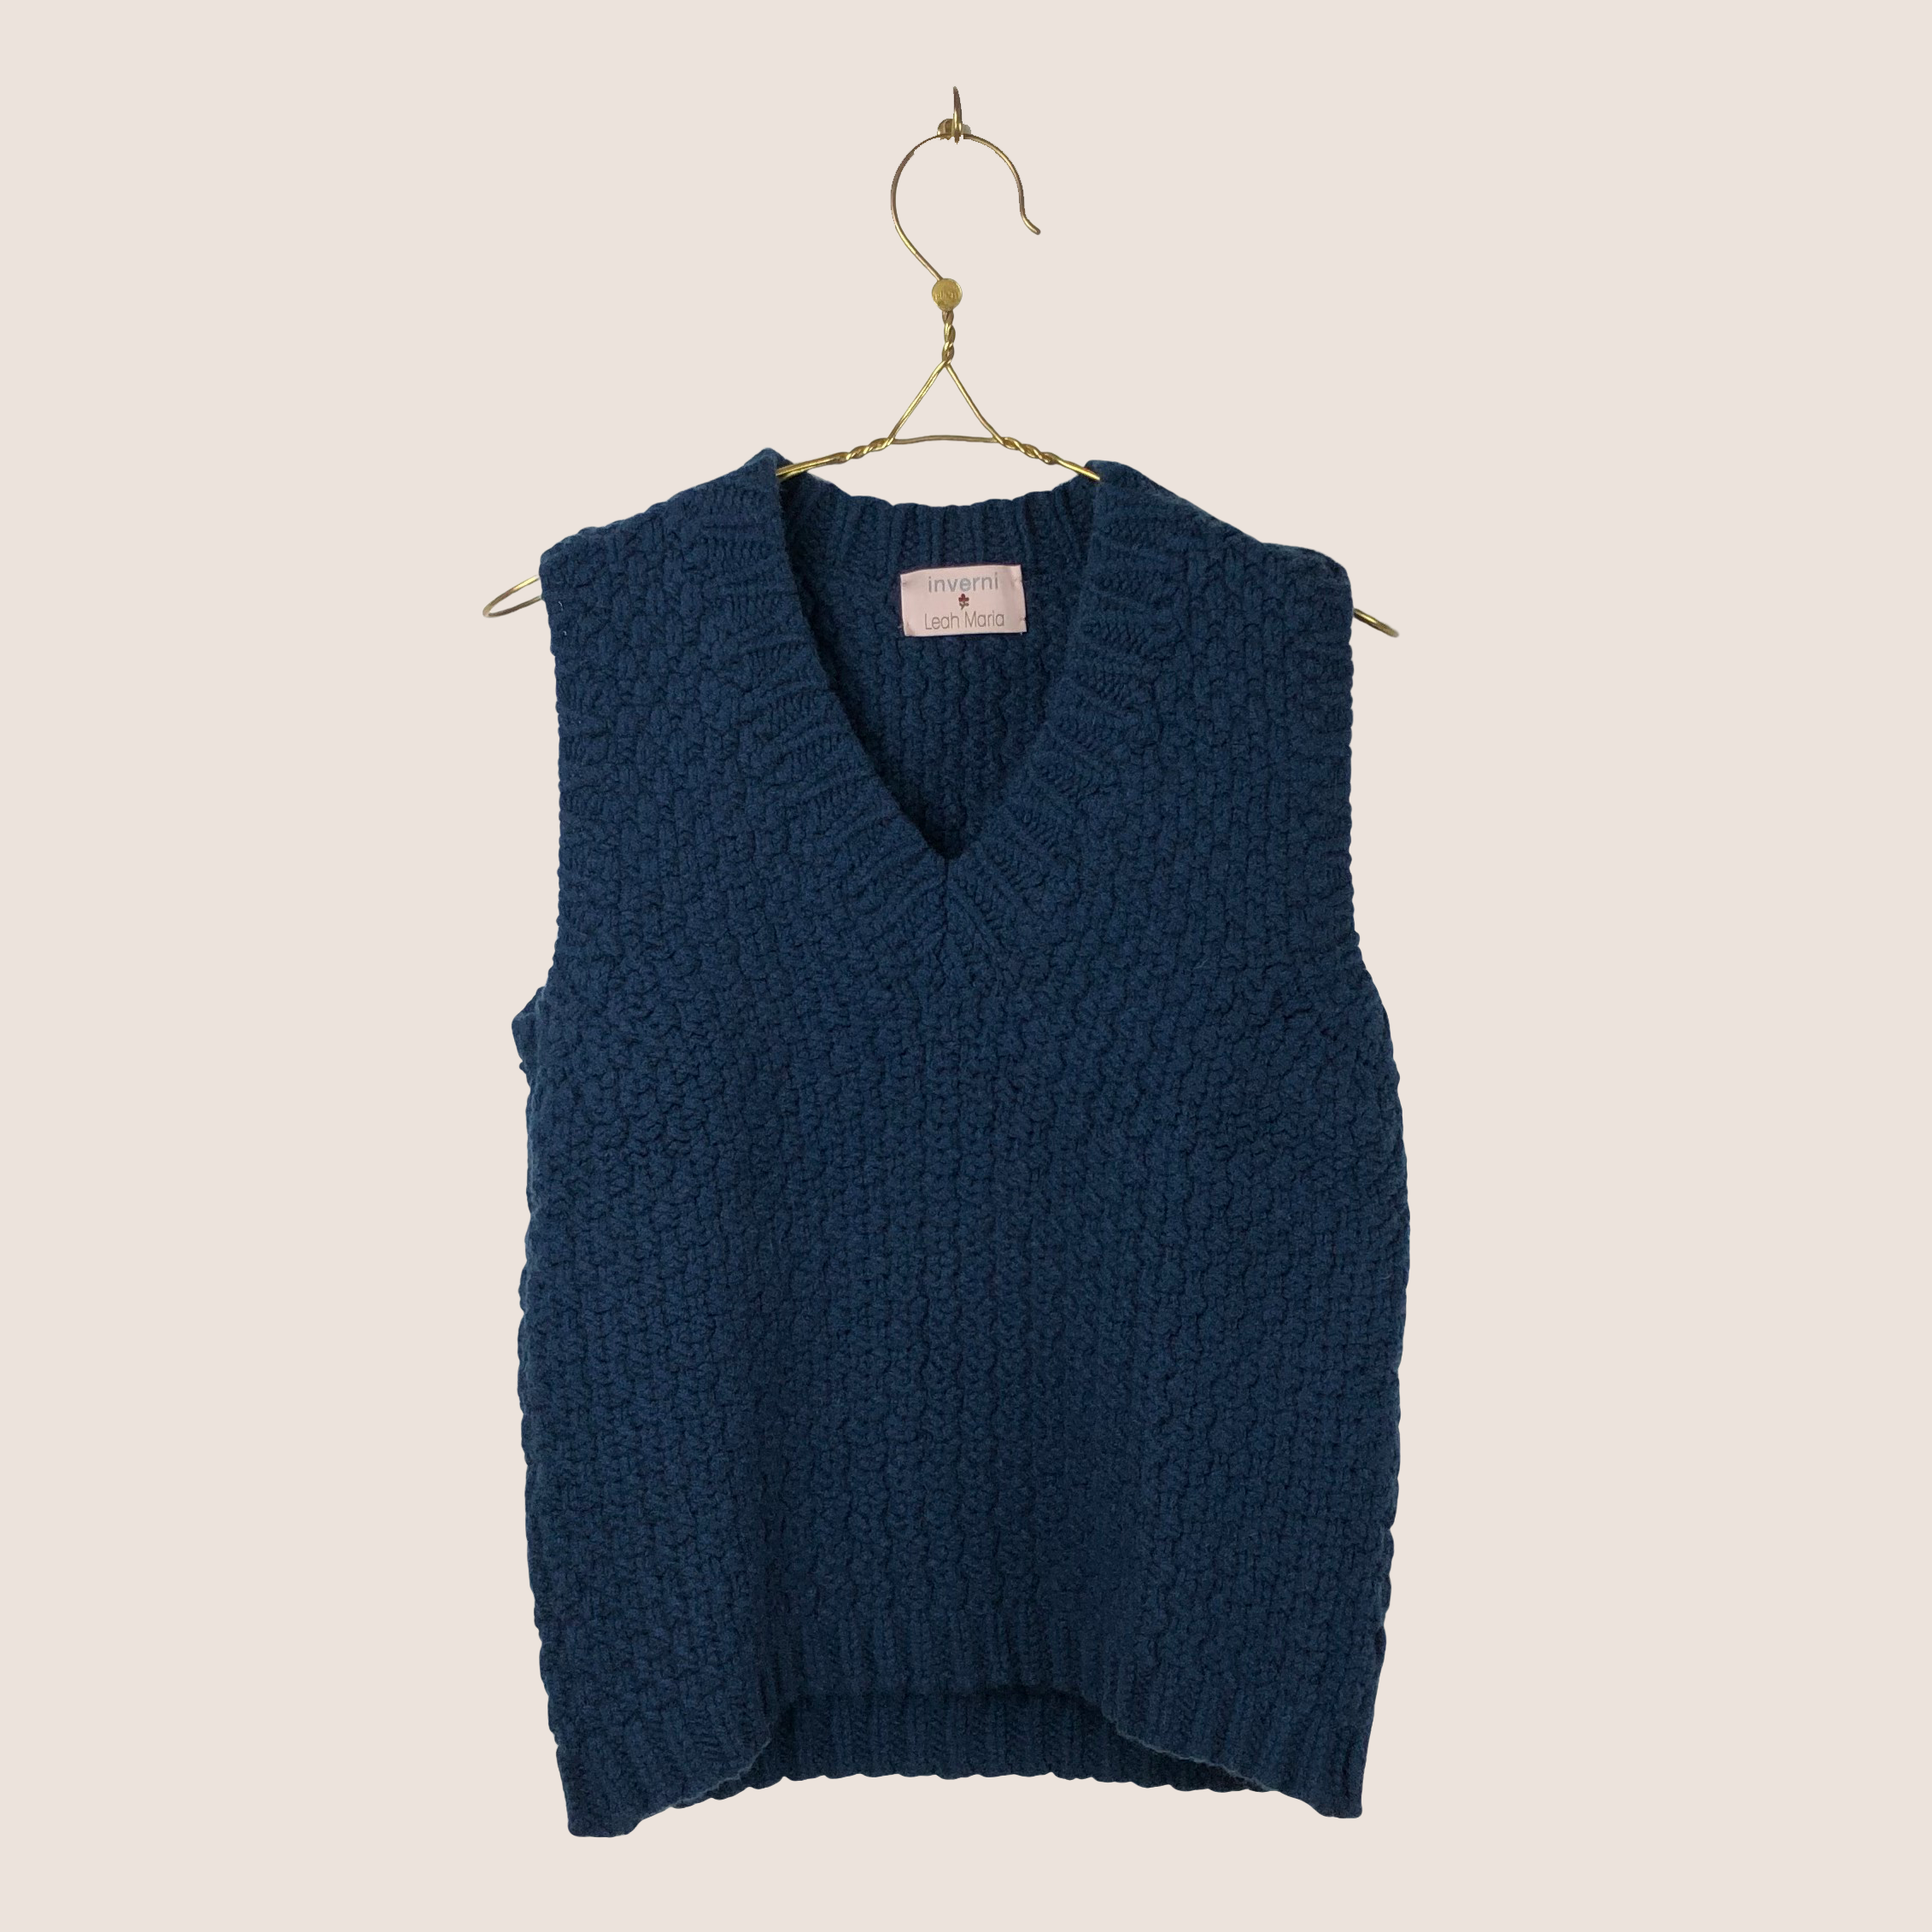 Inverni x LM Knitted Vest